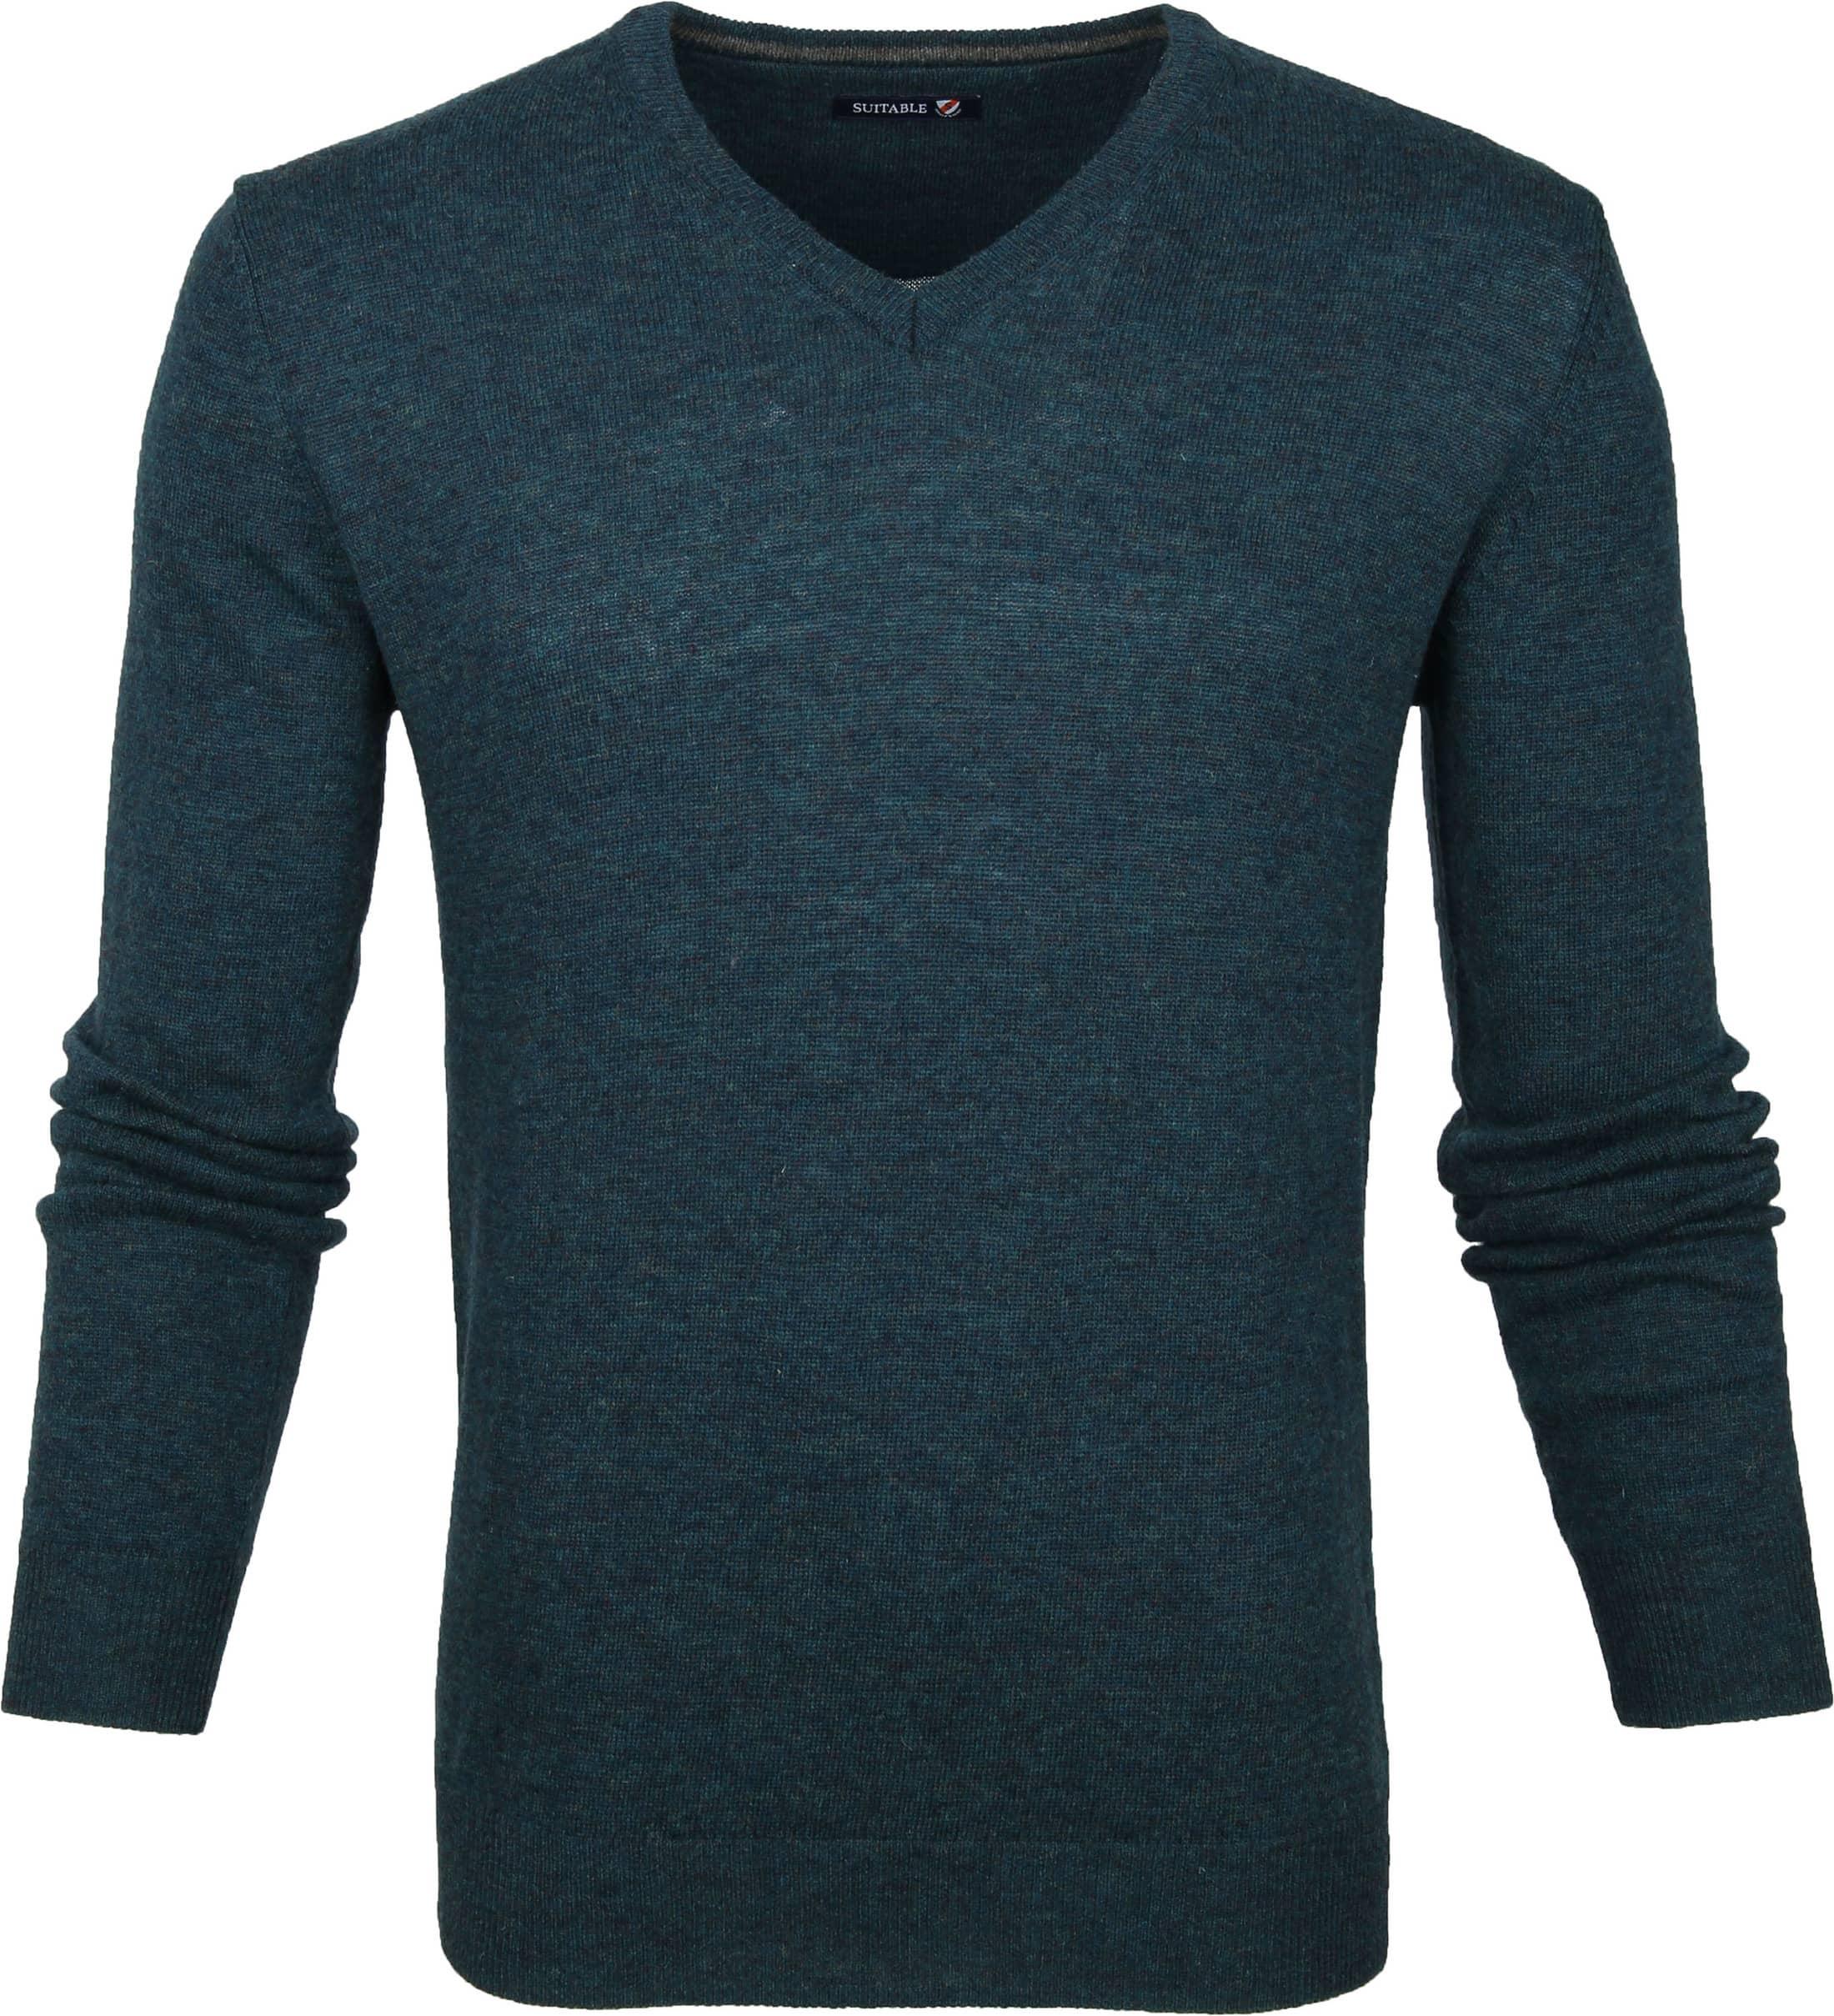 Suitable Pullover V-Hals Lamswol Groen foto 0